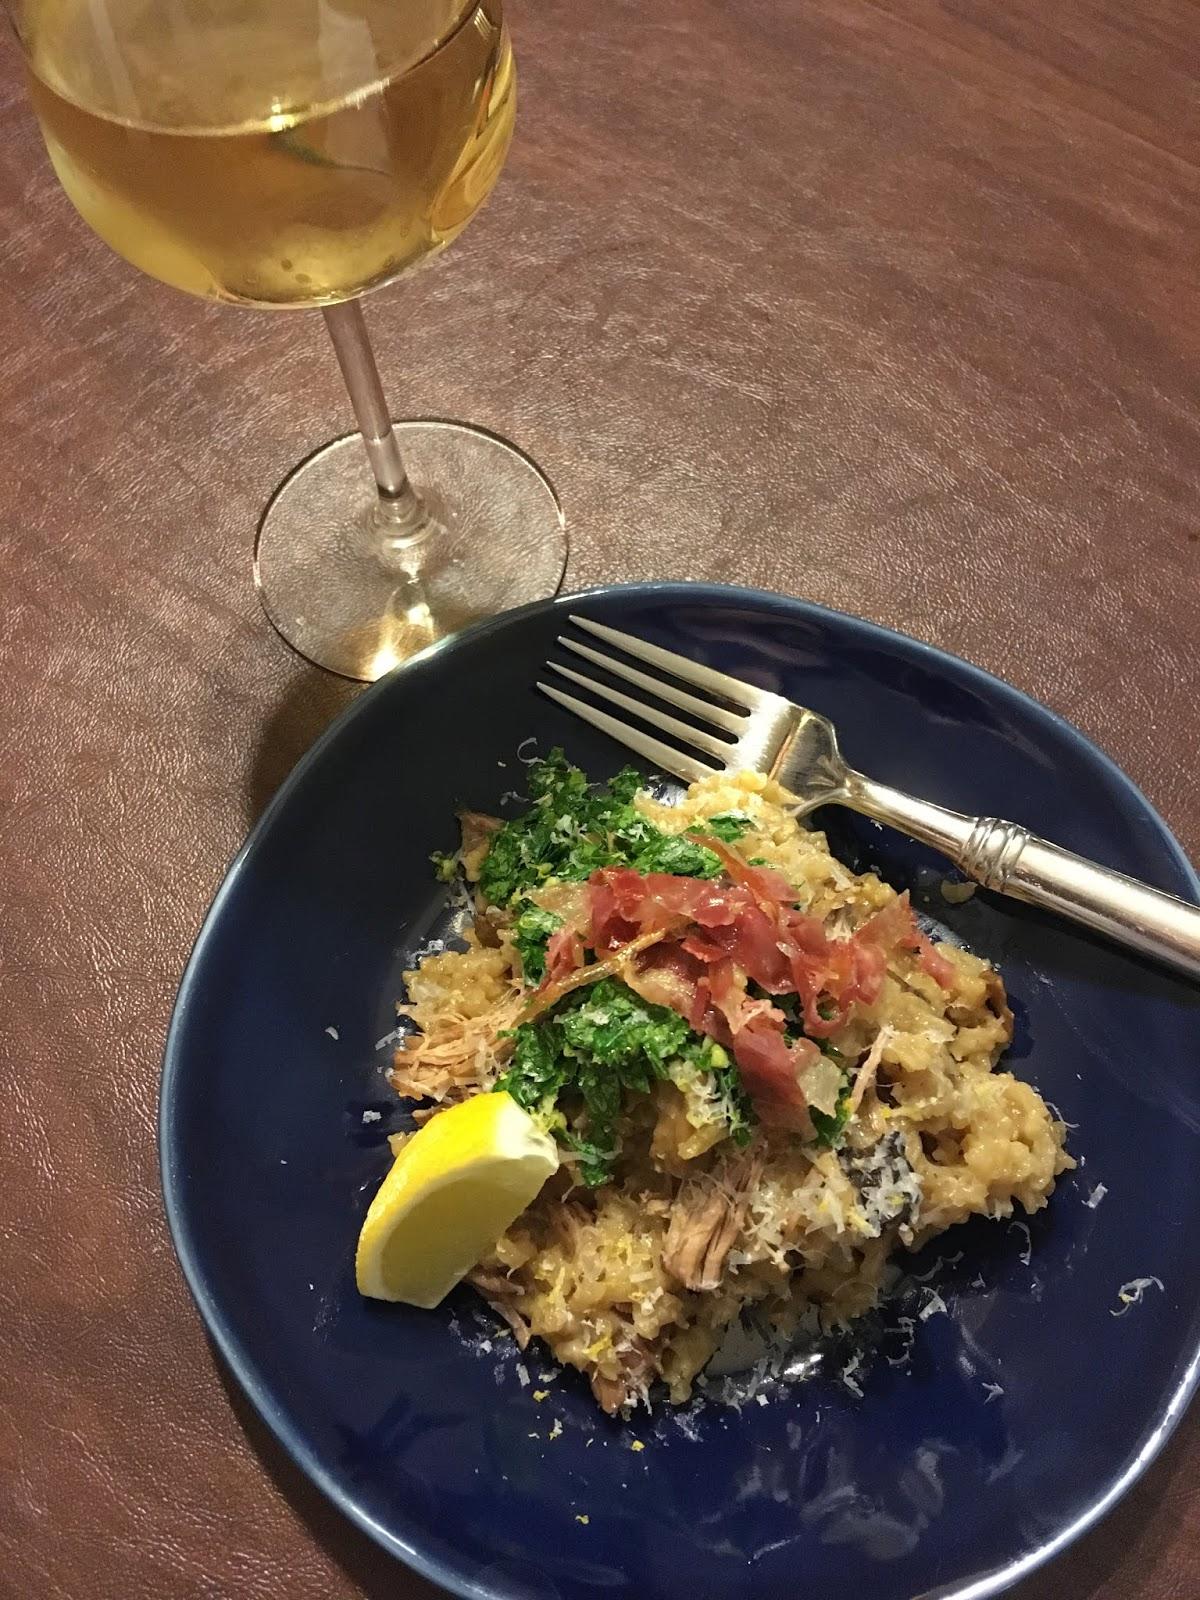 Mushroom Risotto with Braised Pork, Crispy Pancetta, and Gremolata